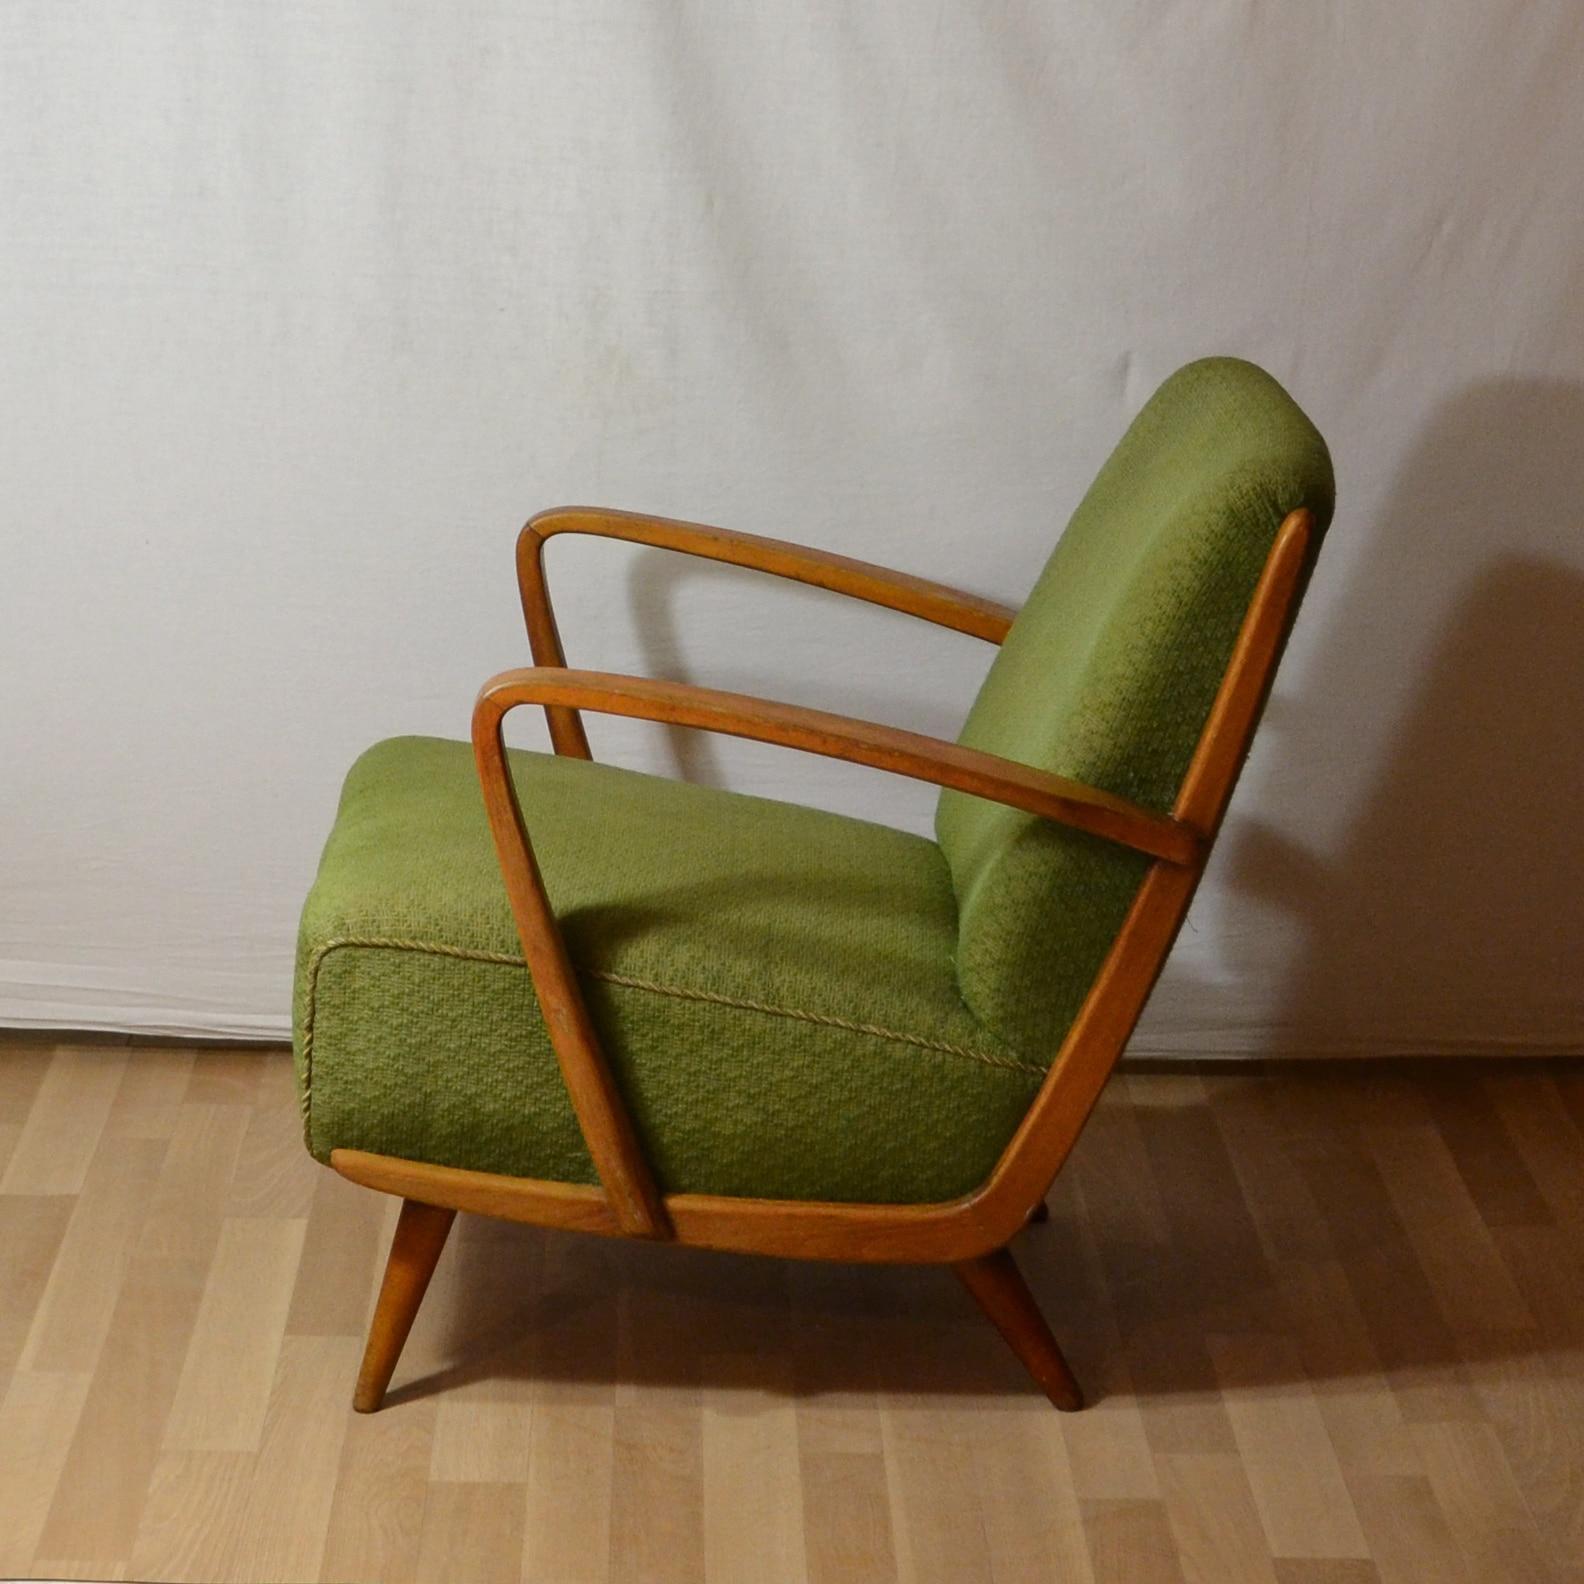 fauteuil ann e 60 cgmrotterdam. Black Bedroom Furniture Sets. Home Design Ideas